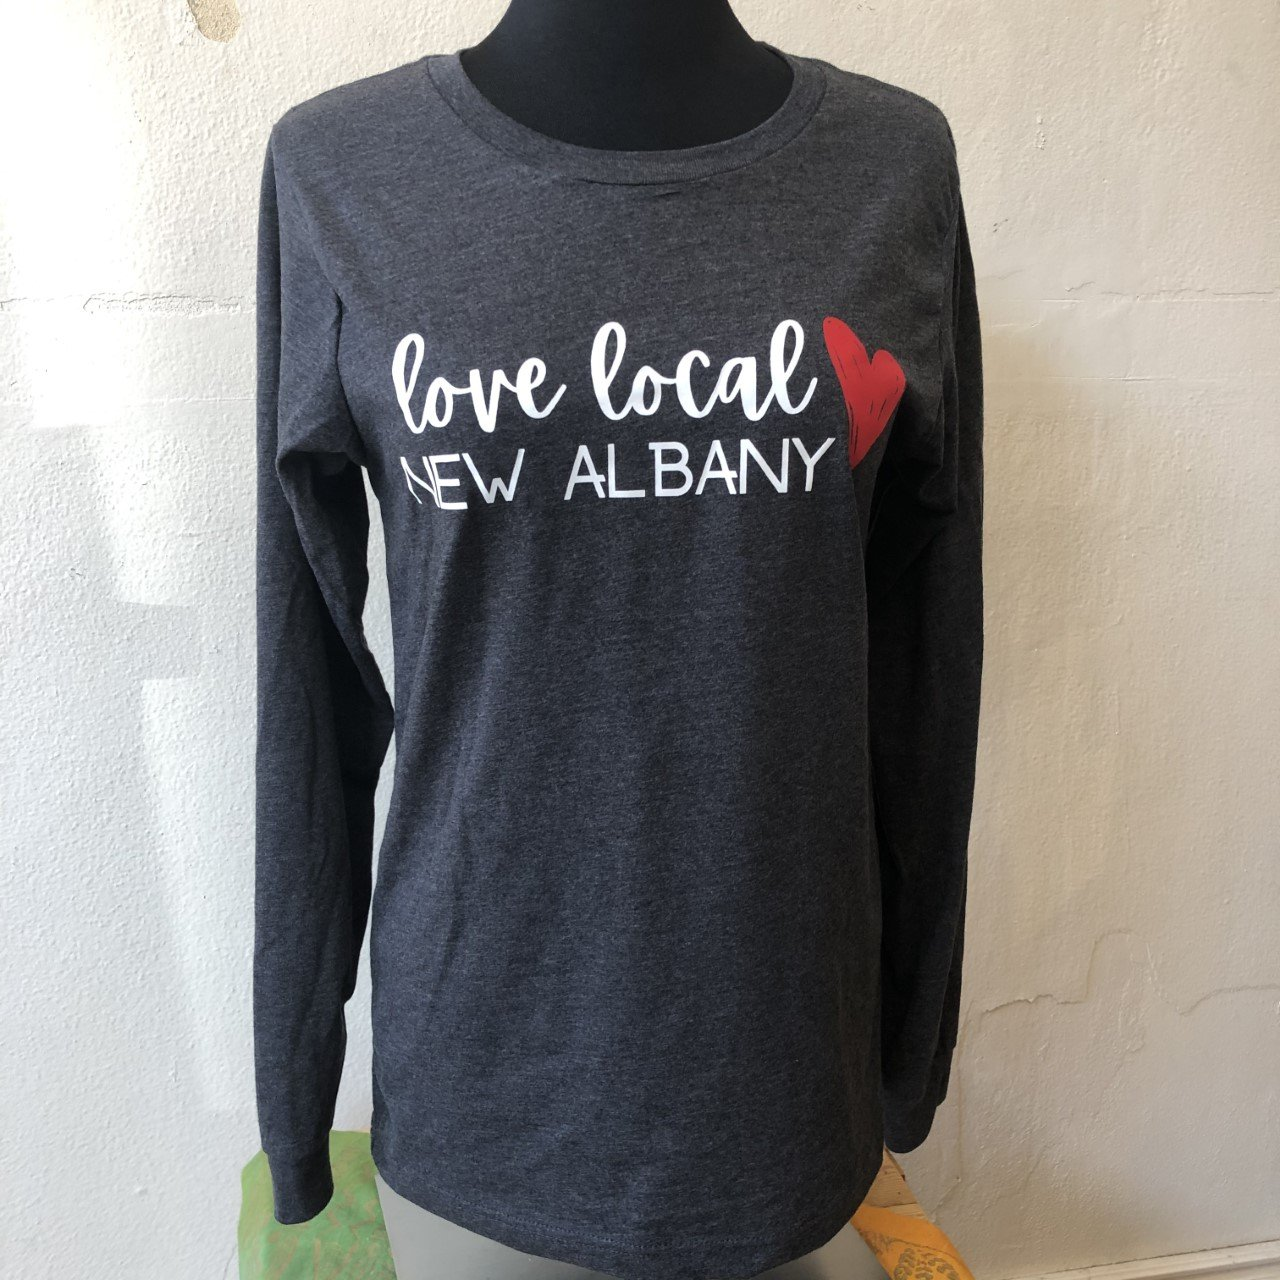 Love Local New Albany L/S T-Shirt - Charcoal